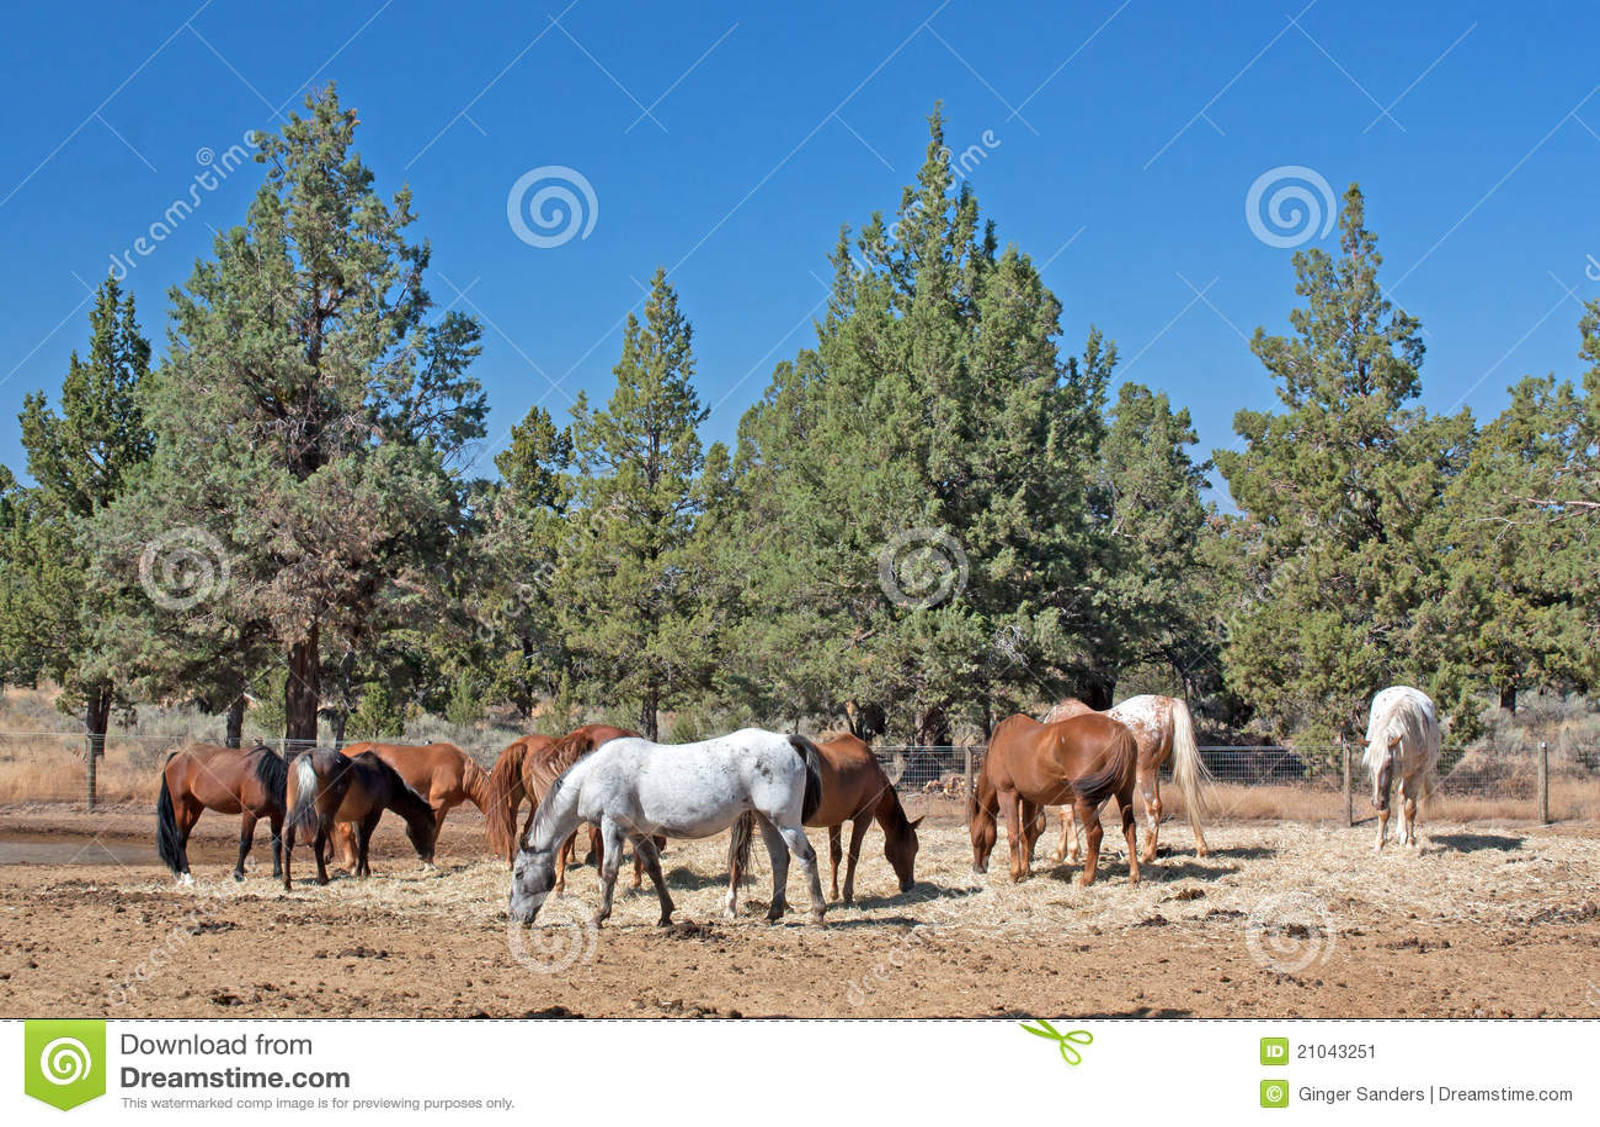 Herd of Horses Grazing Near Juniper